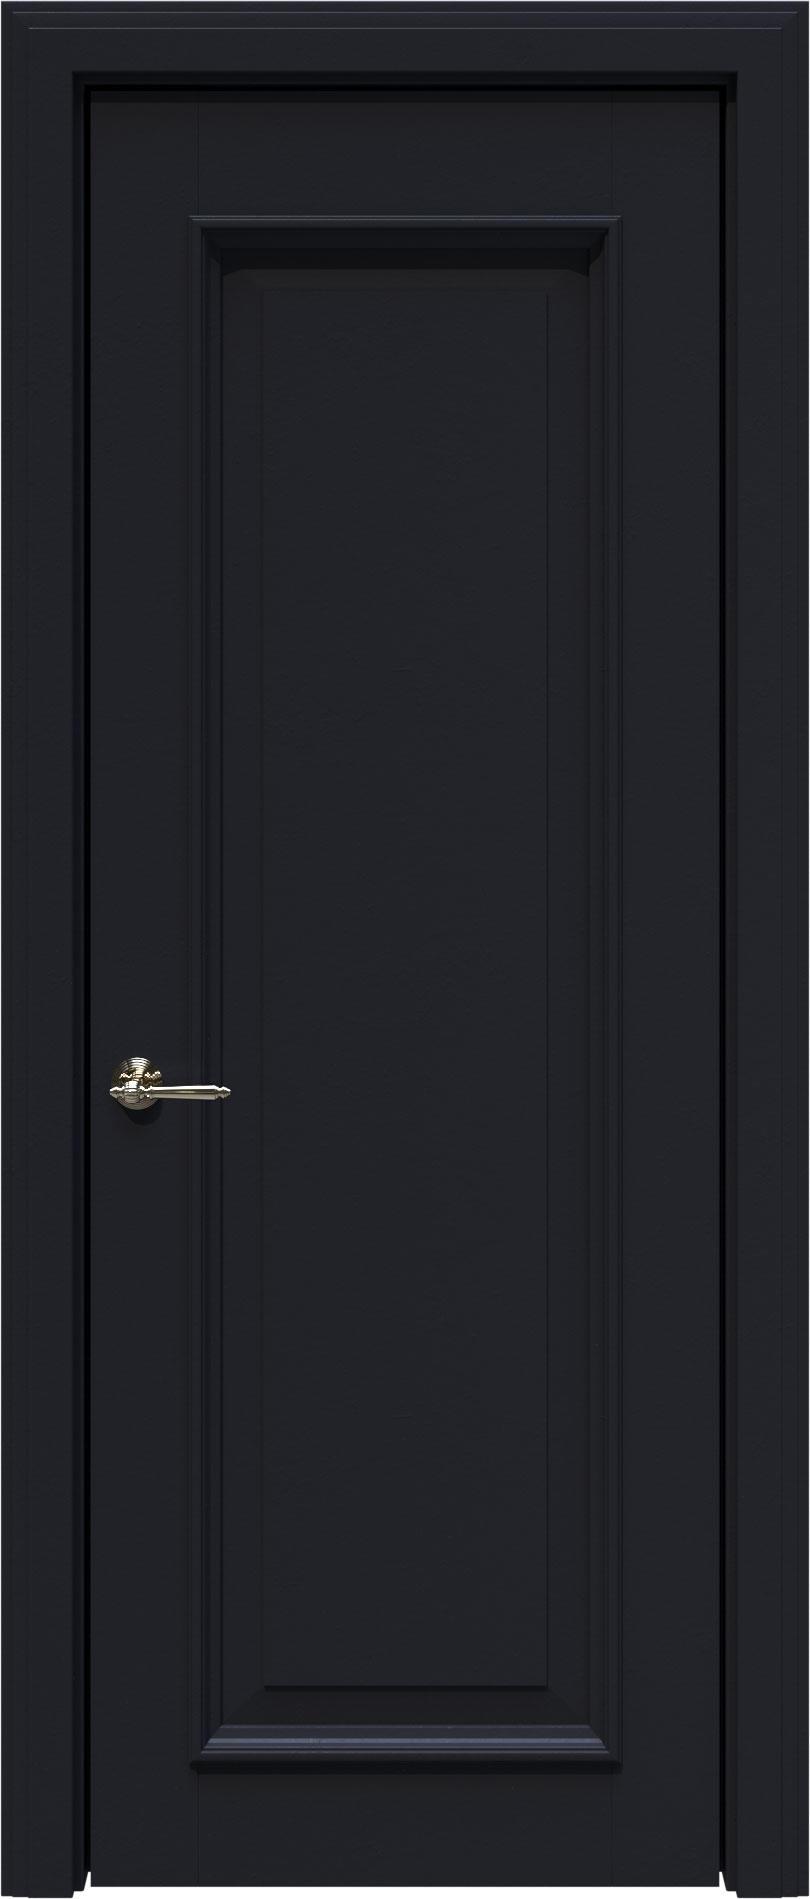 Domenica LUX цвет - Черная эмаль (RAL 9004) Без стекла (ДГ)